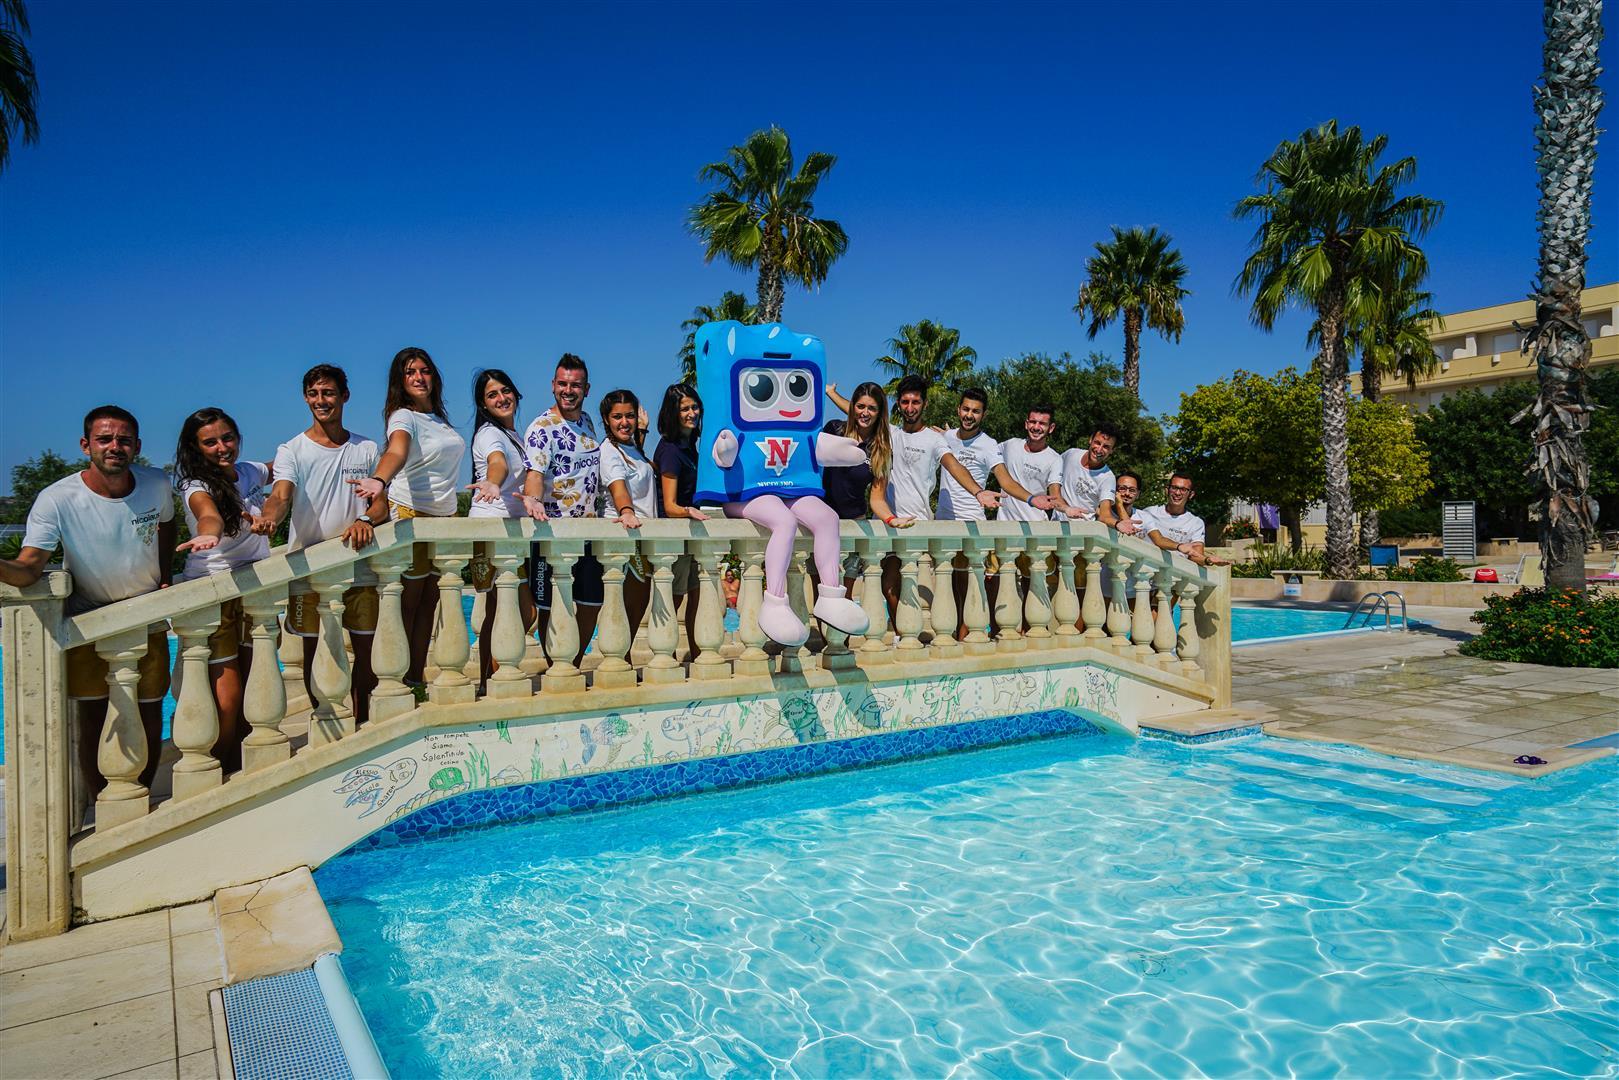 NICOLAUS CLUB LA GIURLITA-RESIDENCE | Marina di Ugento